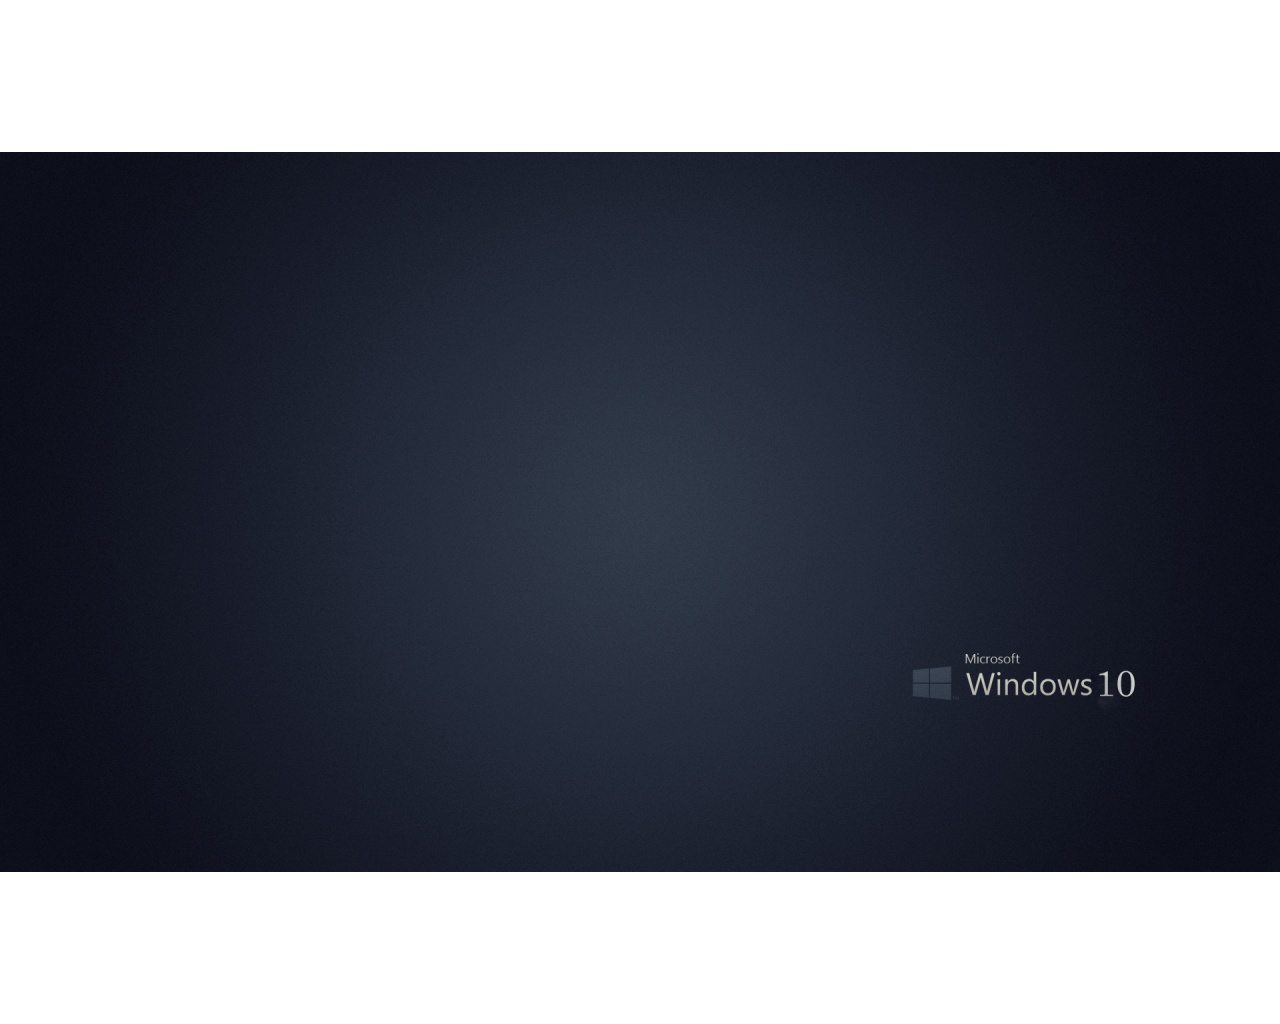 Windows 10 Wallpaper 1280x1024 Wallpapersafari